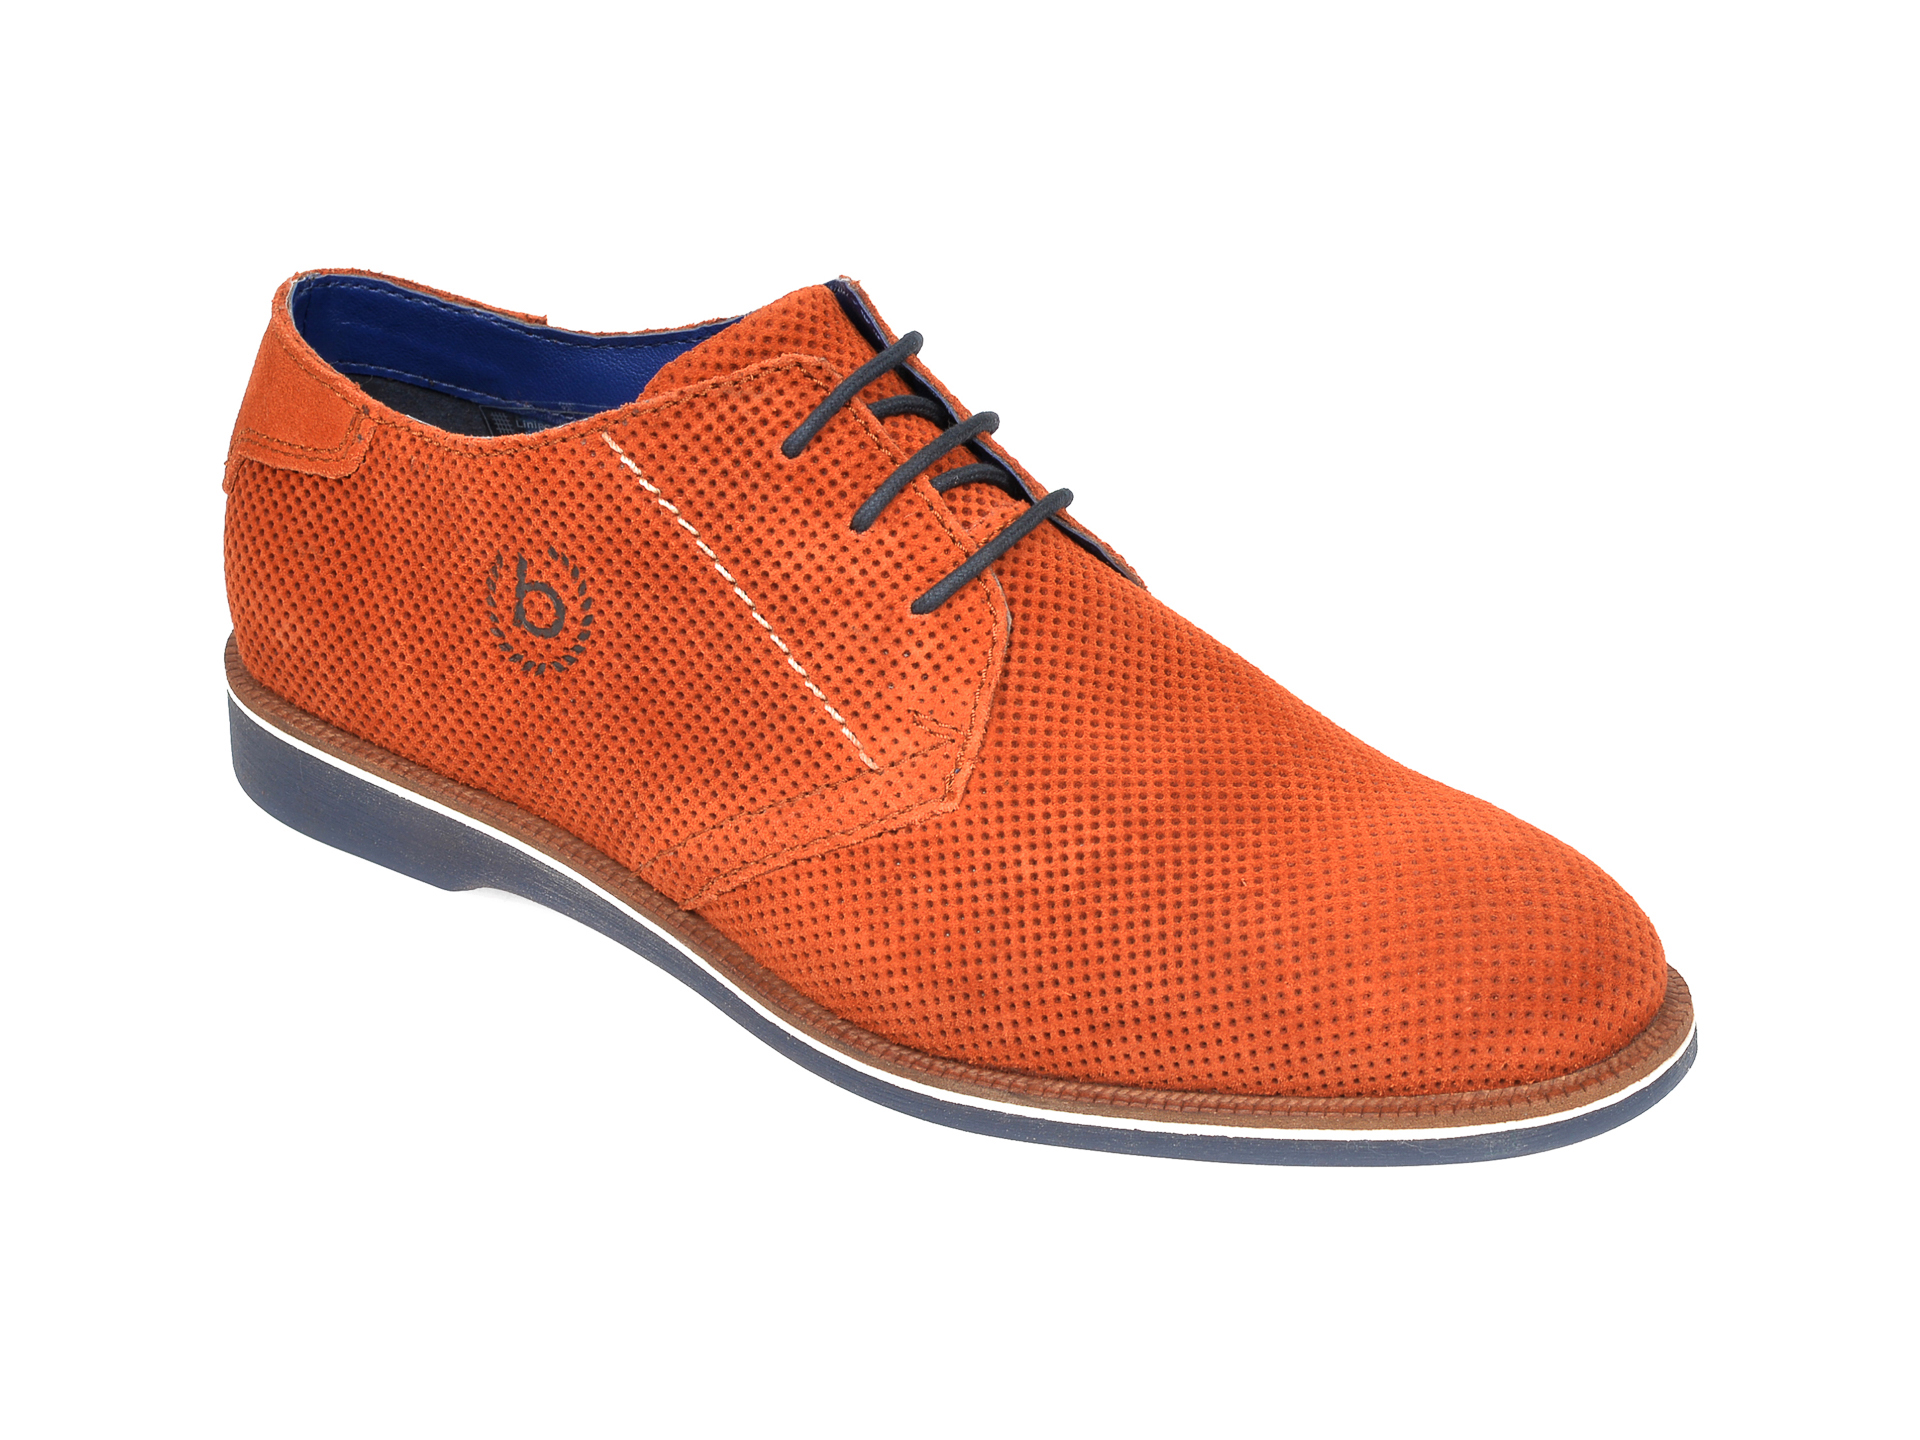 Pantofi BUGATTI maro, 64706, din piele intoarsa